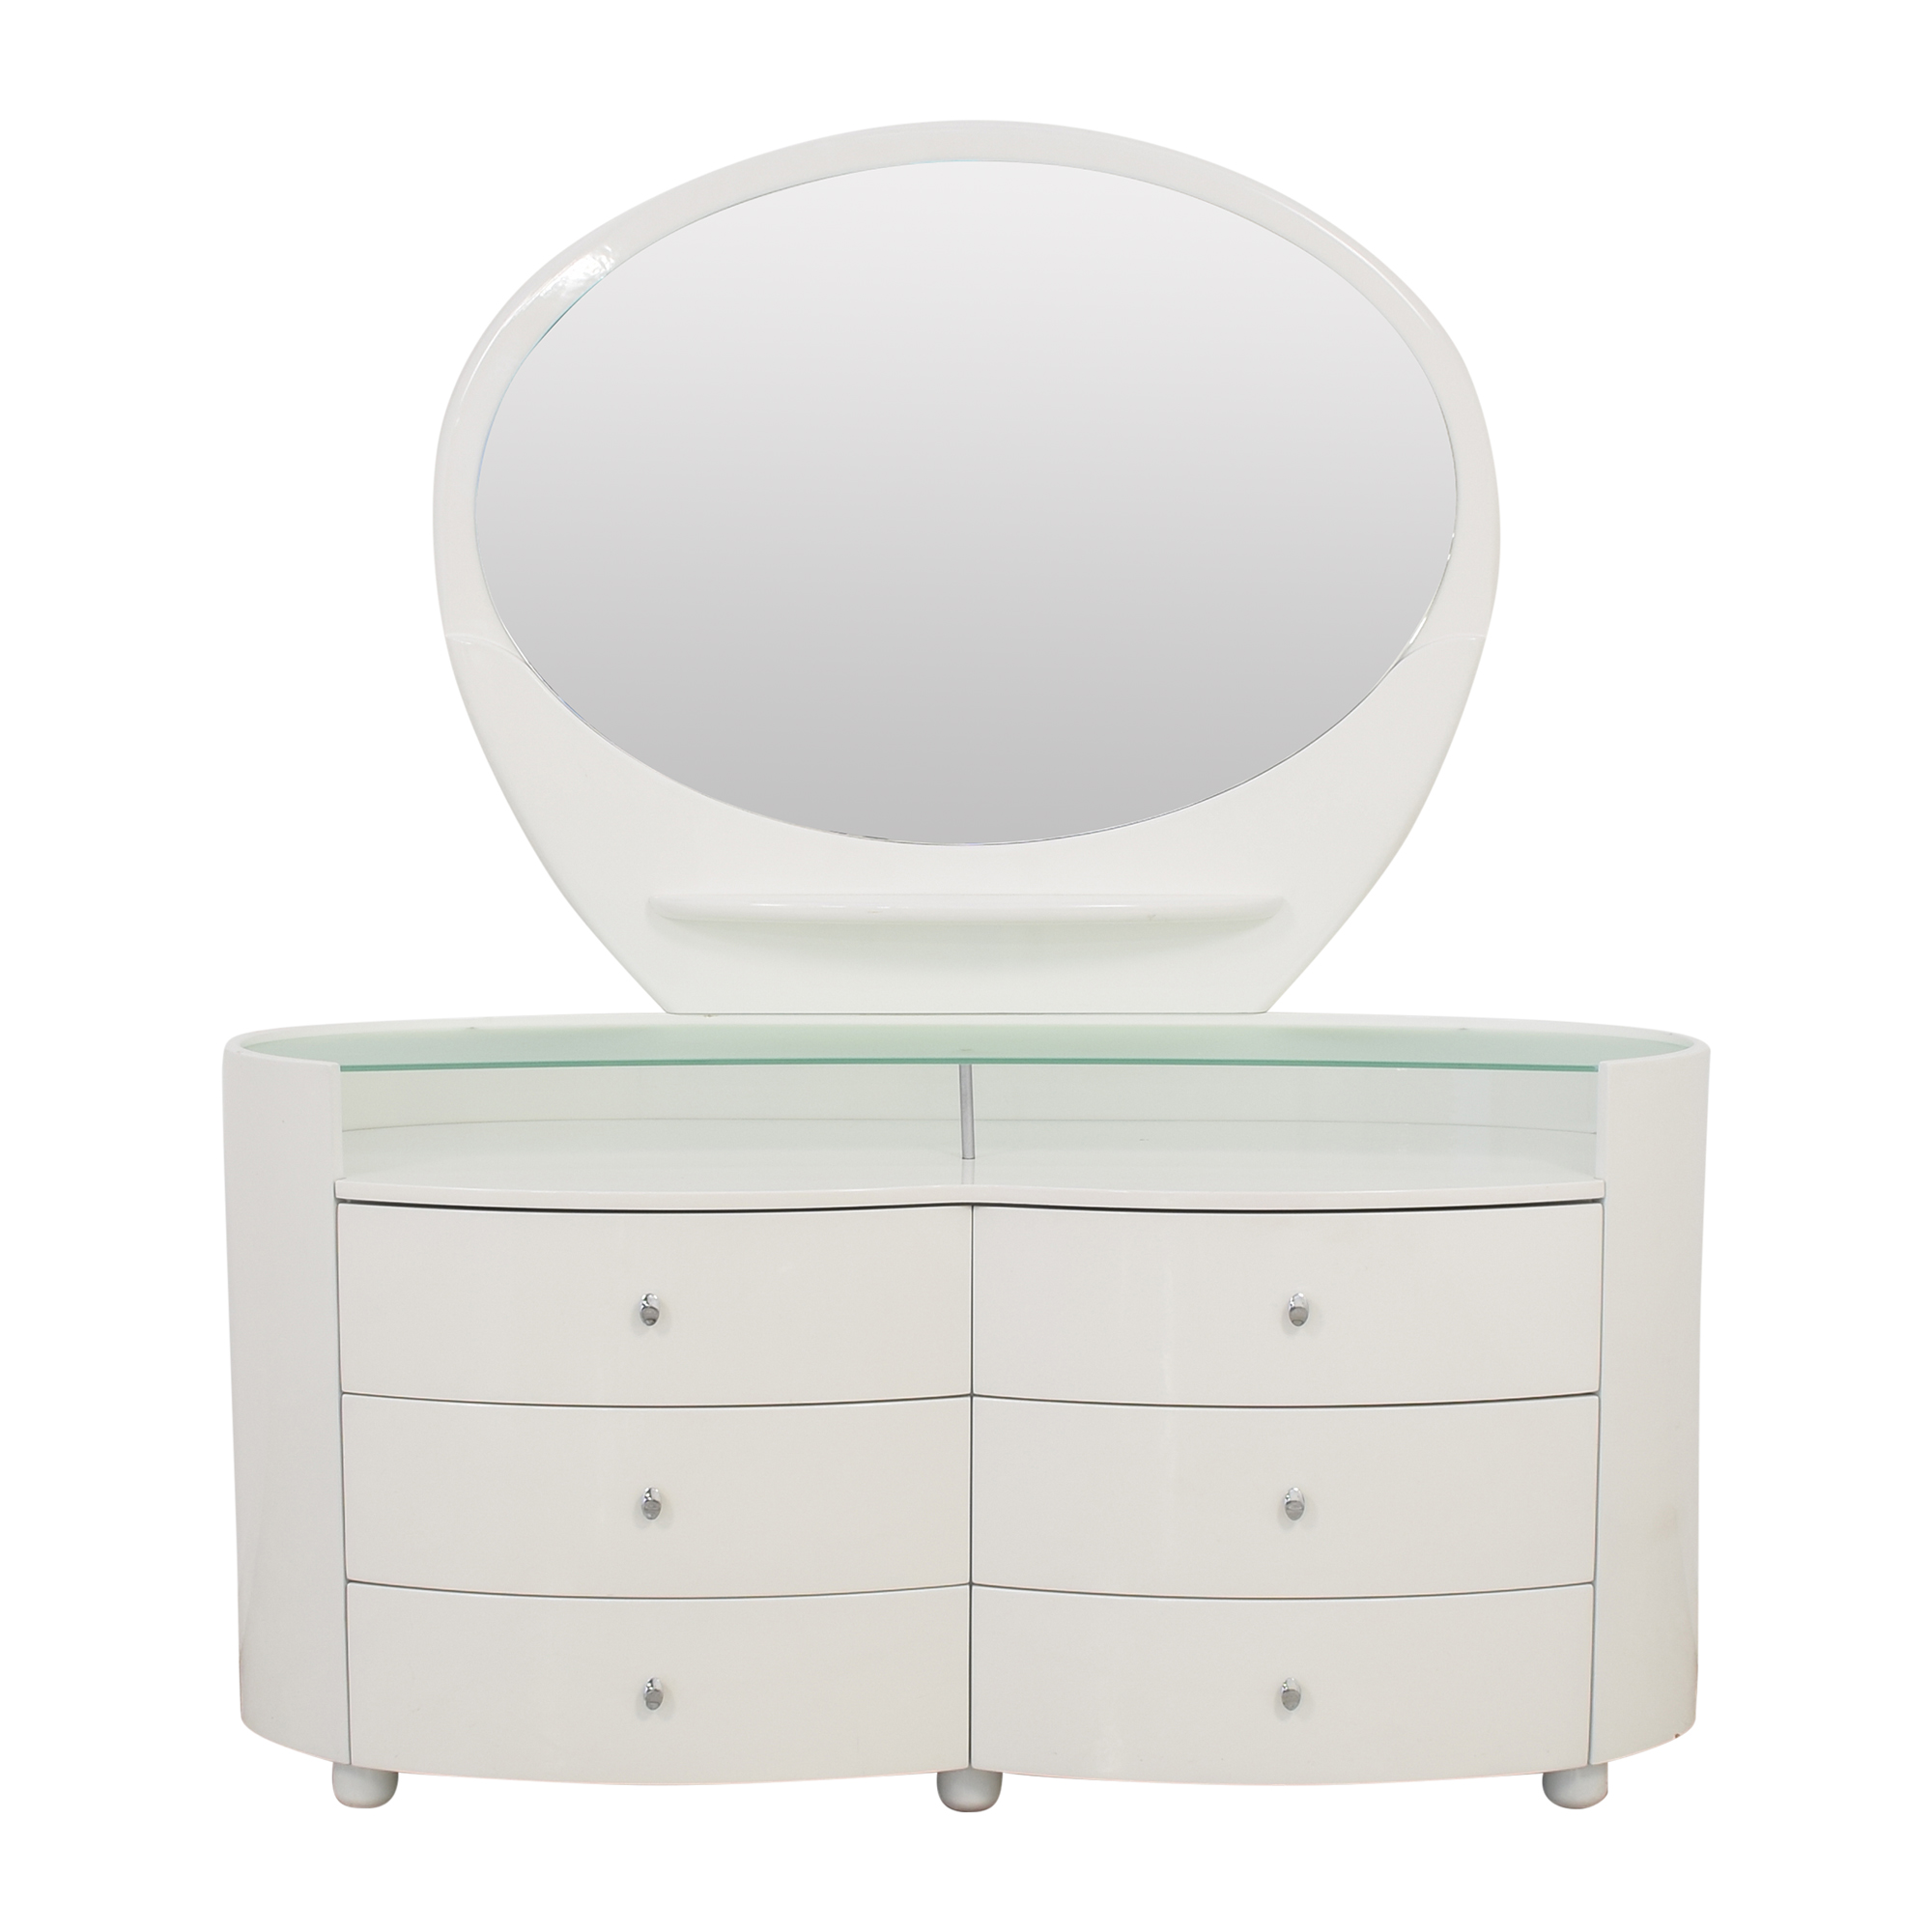 Vintage Style Dresser with Vanity Mirror nj